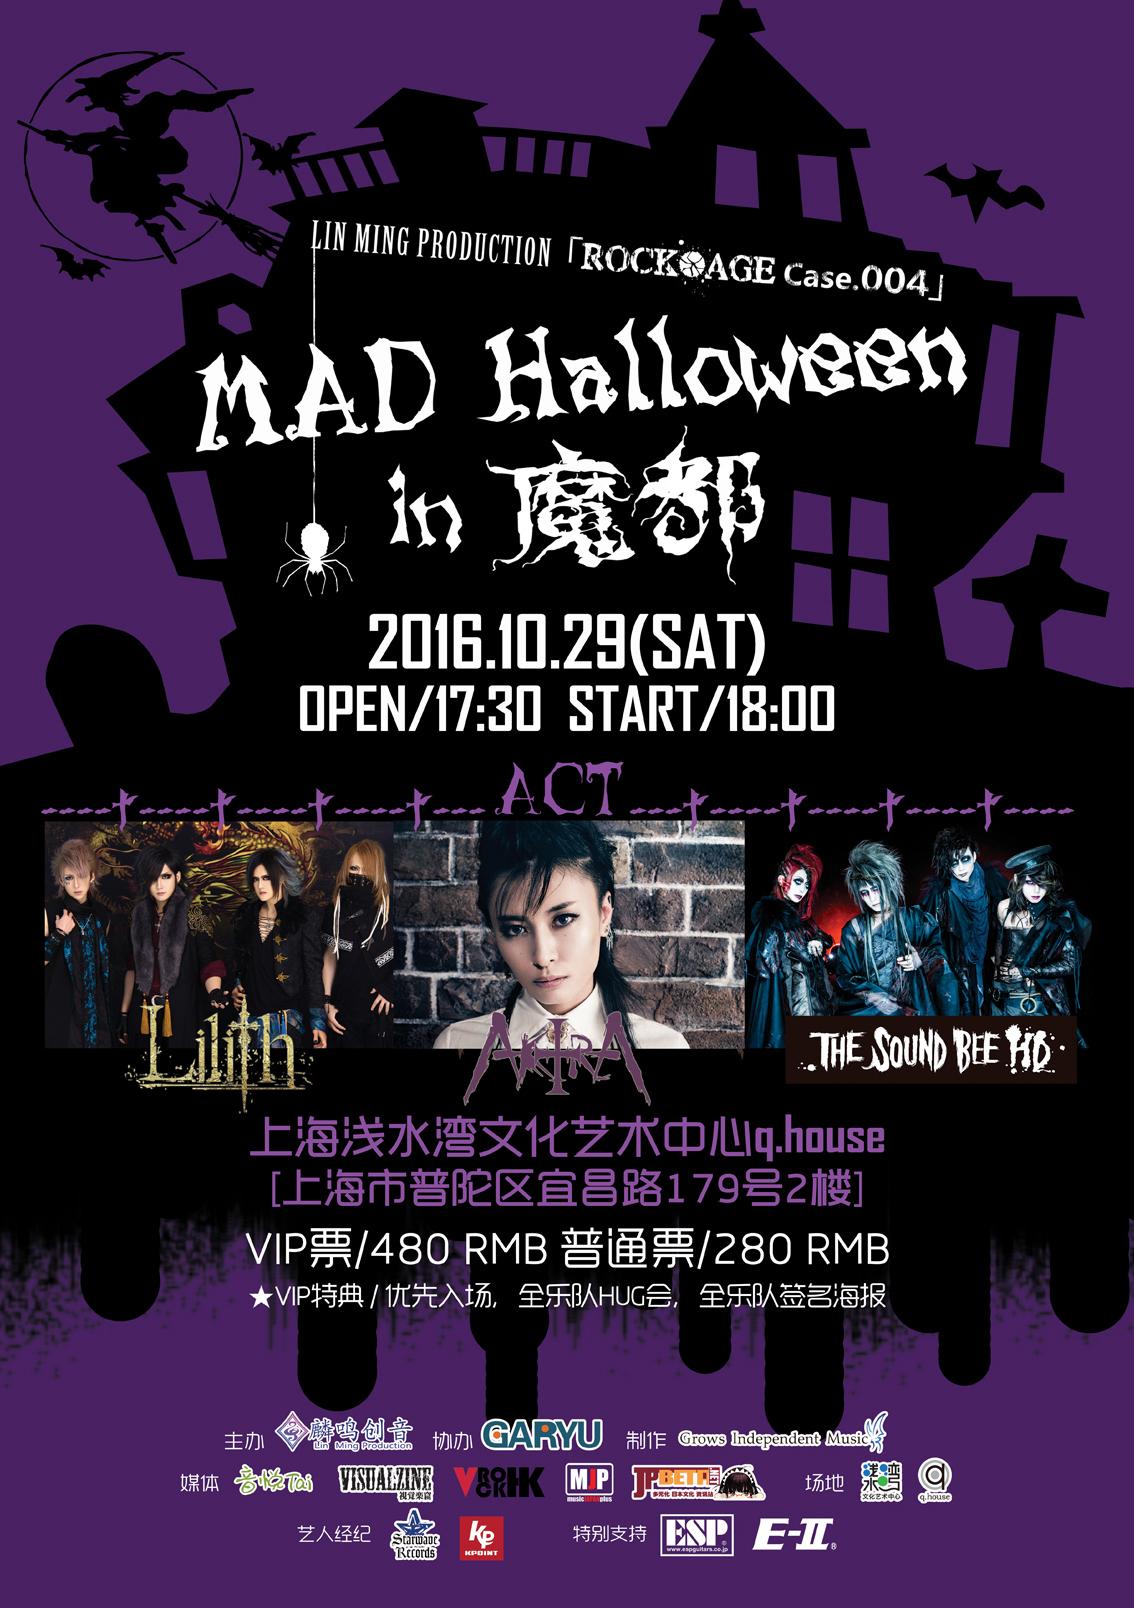 MAD Halloween 2016